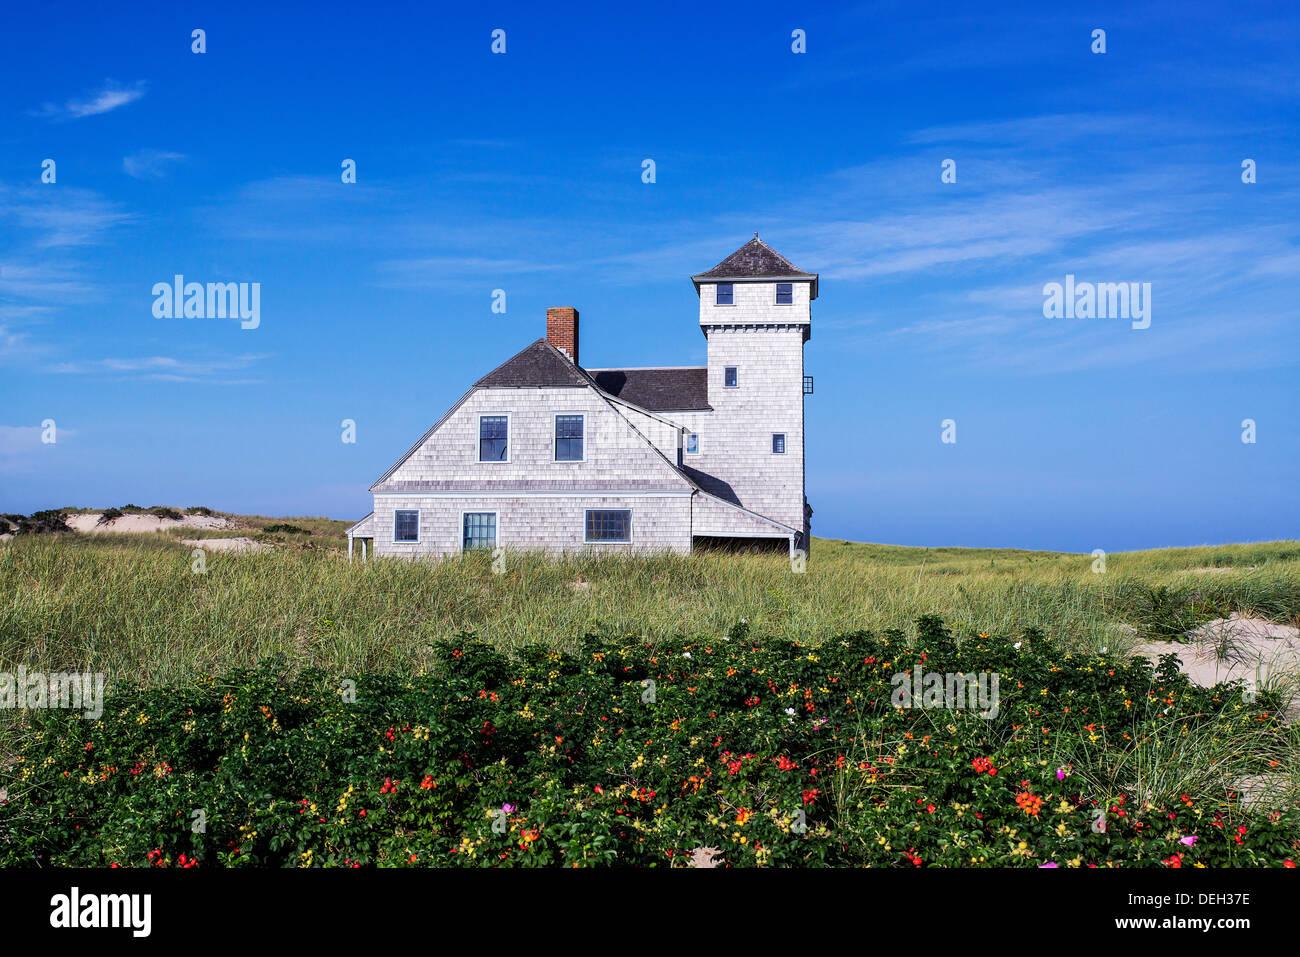 Old Harbor Life Saving Station Museum, Race Point, Cape Cod, Massachusetts, USA - Stock Image